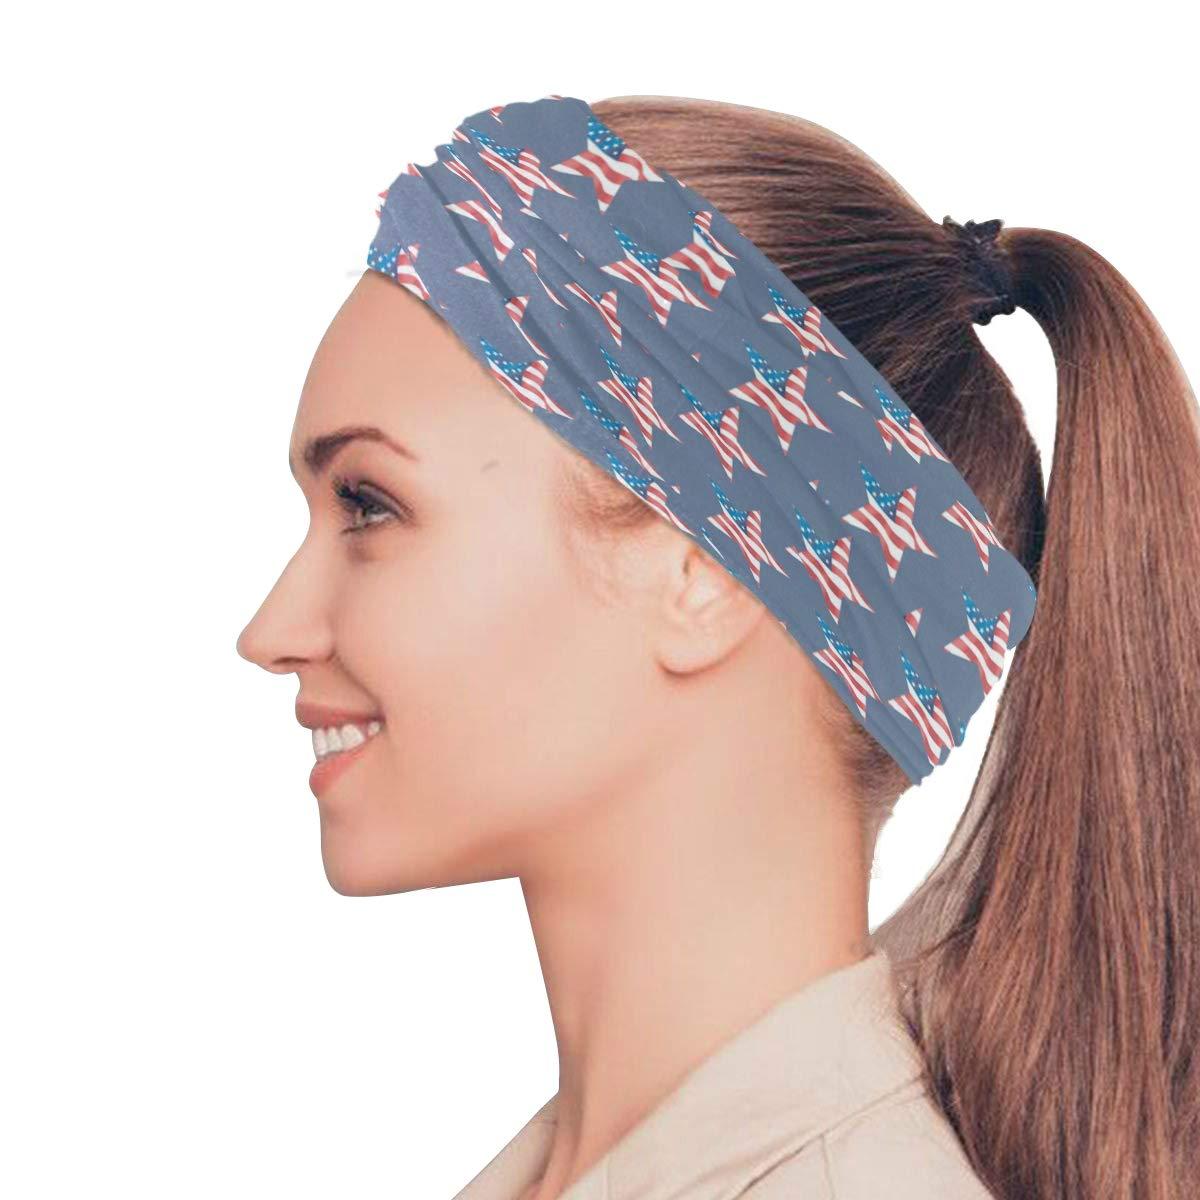 Magic Headwear Parrot Bright Outdoor Scarf Headbands Bandana Mask Neck Gaiter Head Wrap Mask Sweatband